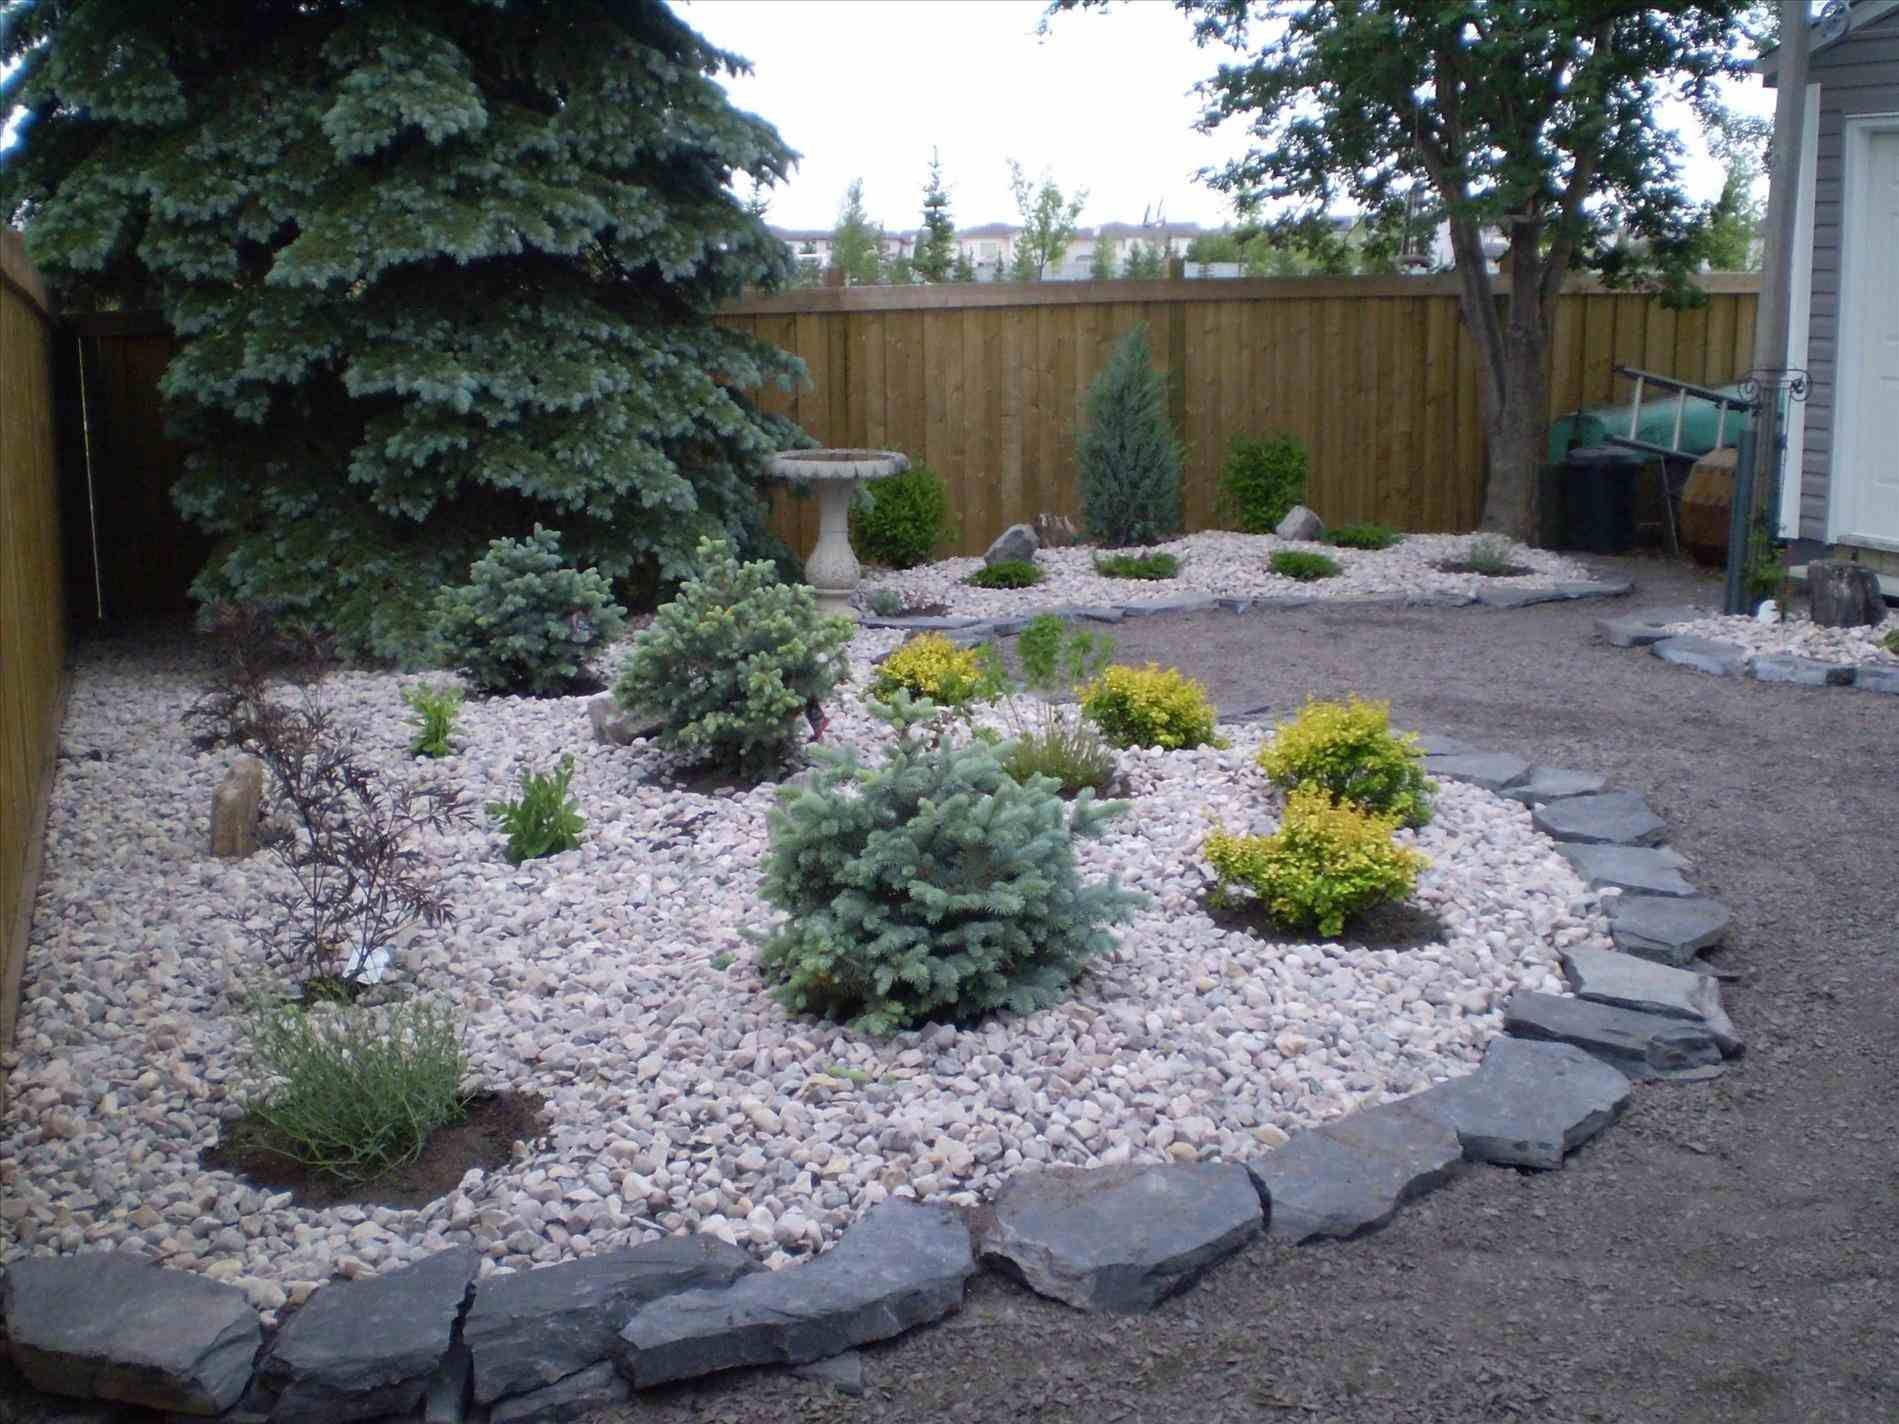 Easy Low Maintenance Backyard Landscaping Ideas Landscaping With Rocks Low Maintenance Landscaping Low Maintenance Garden Design